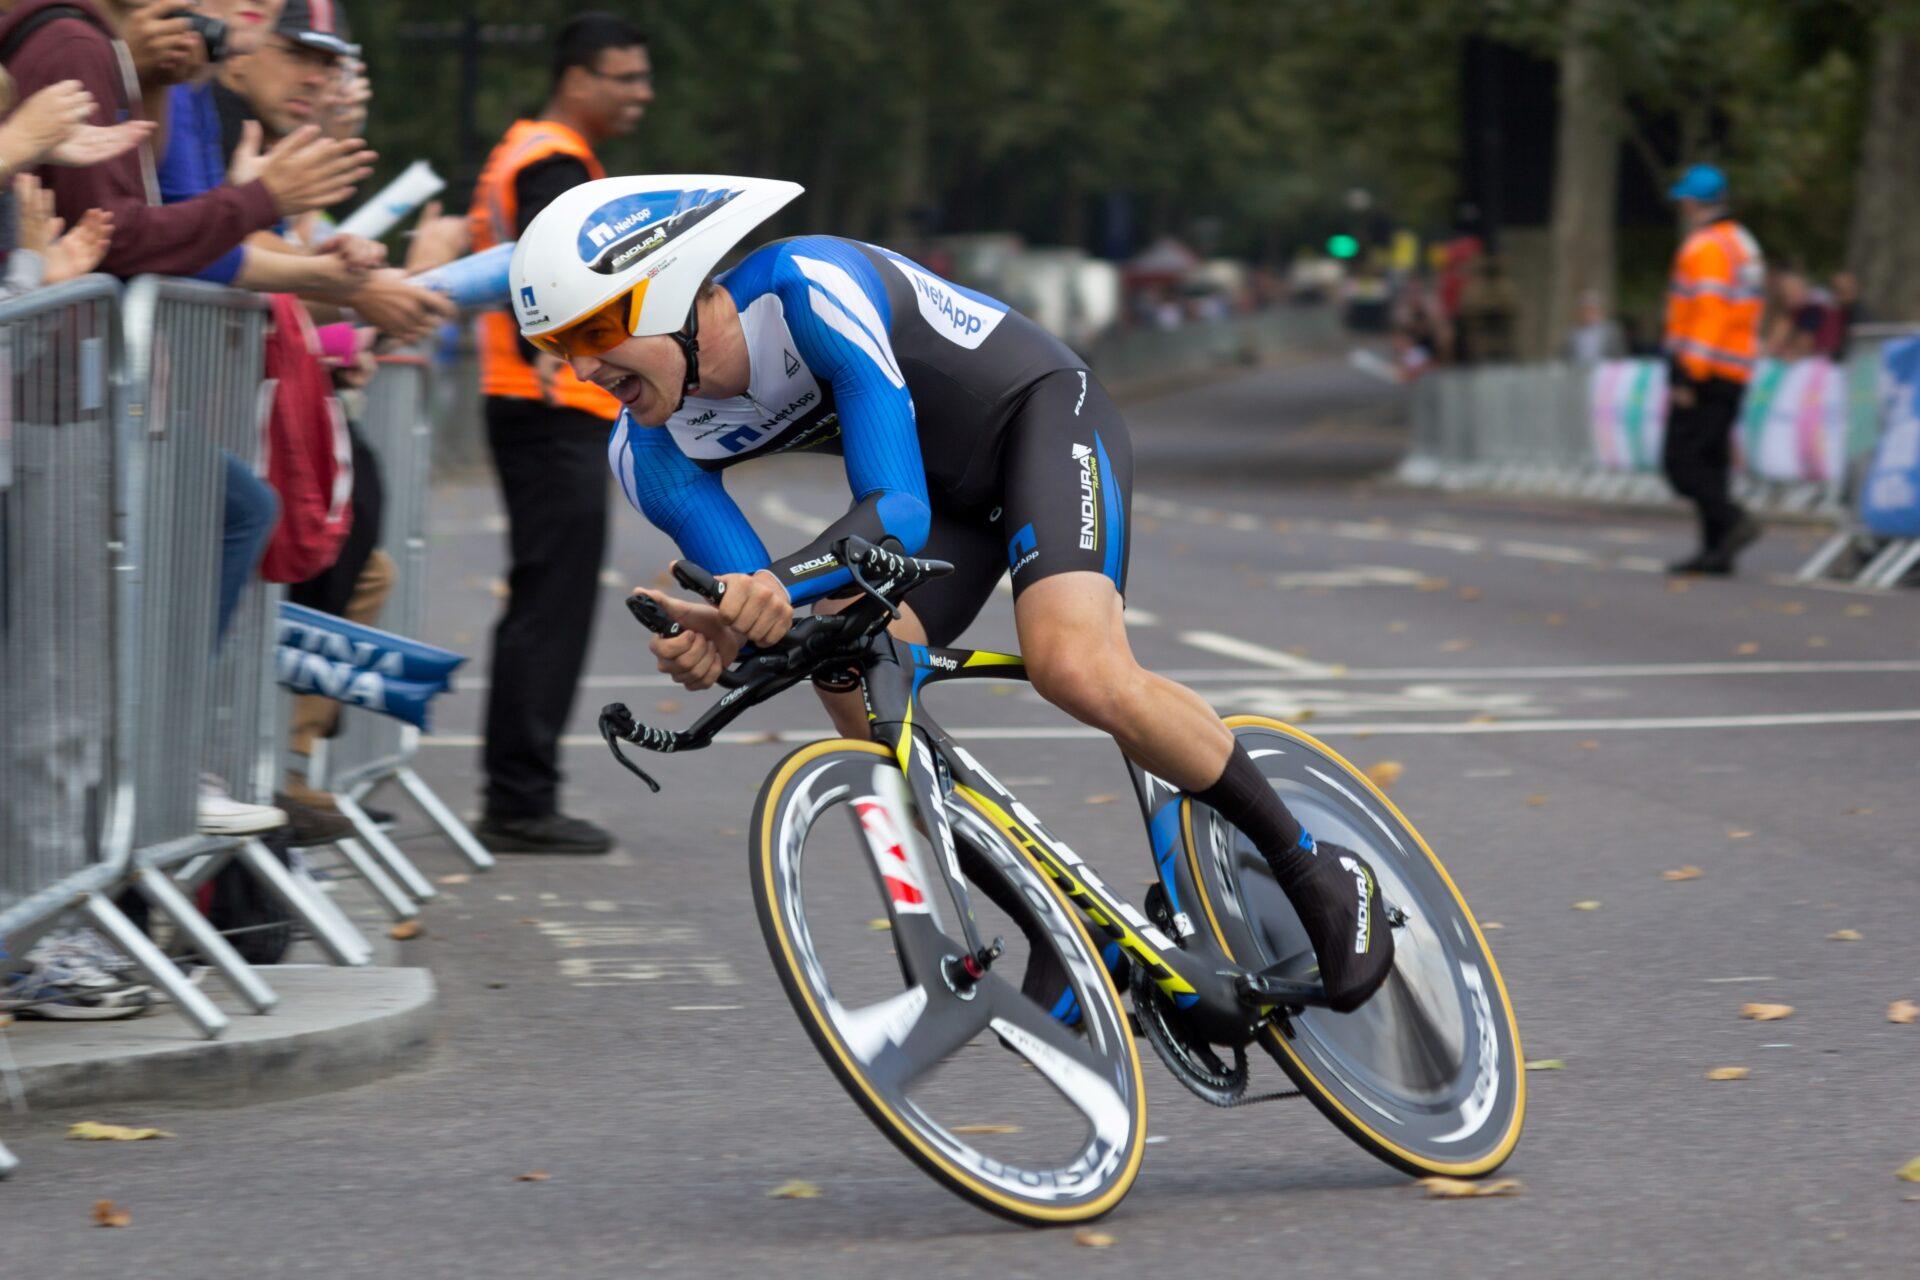 Scott Thwaites going round a corner at the 2014 Tour of Britain